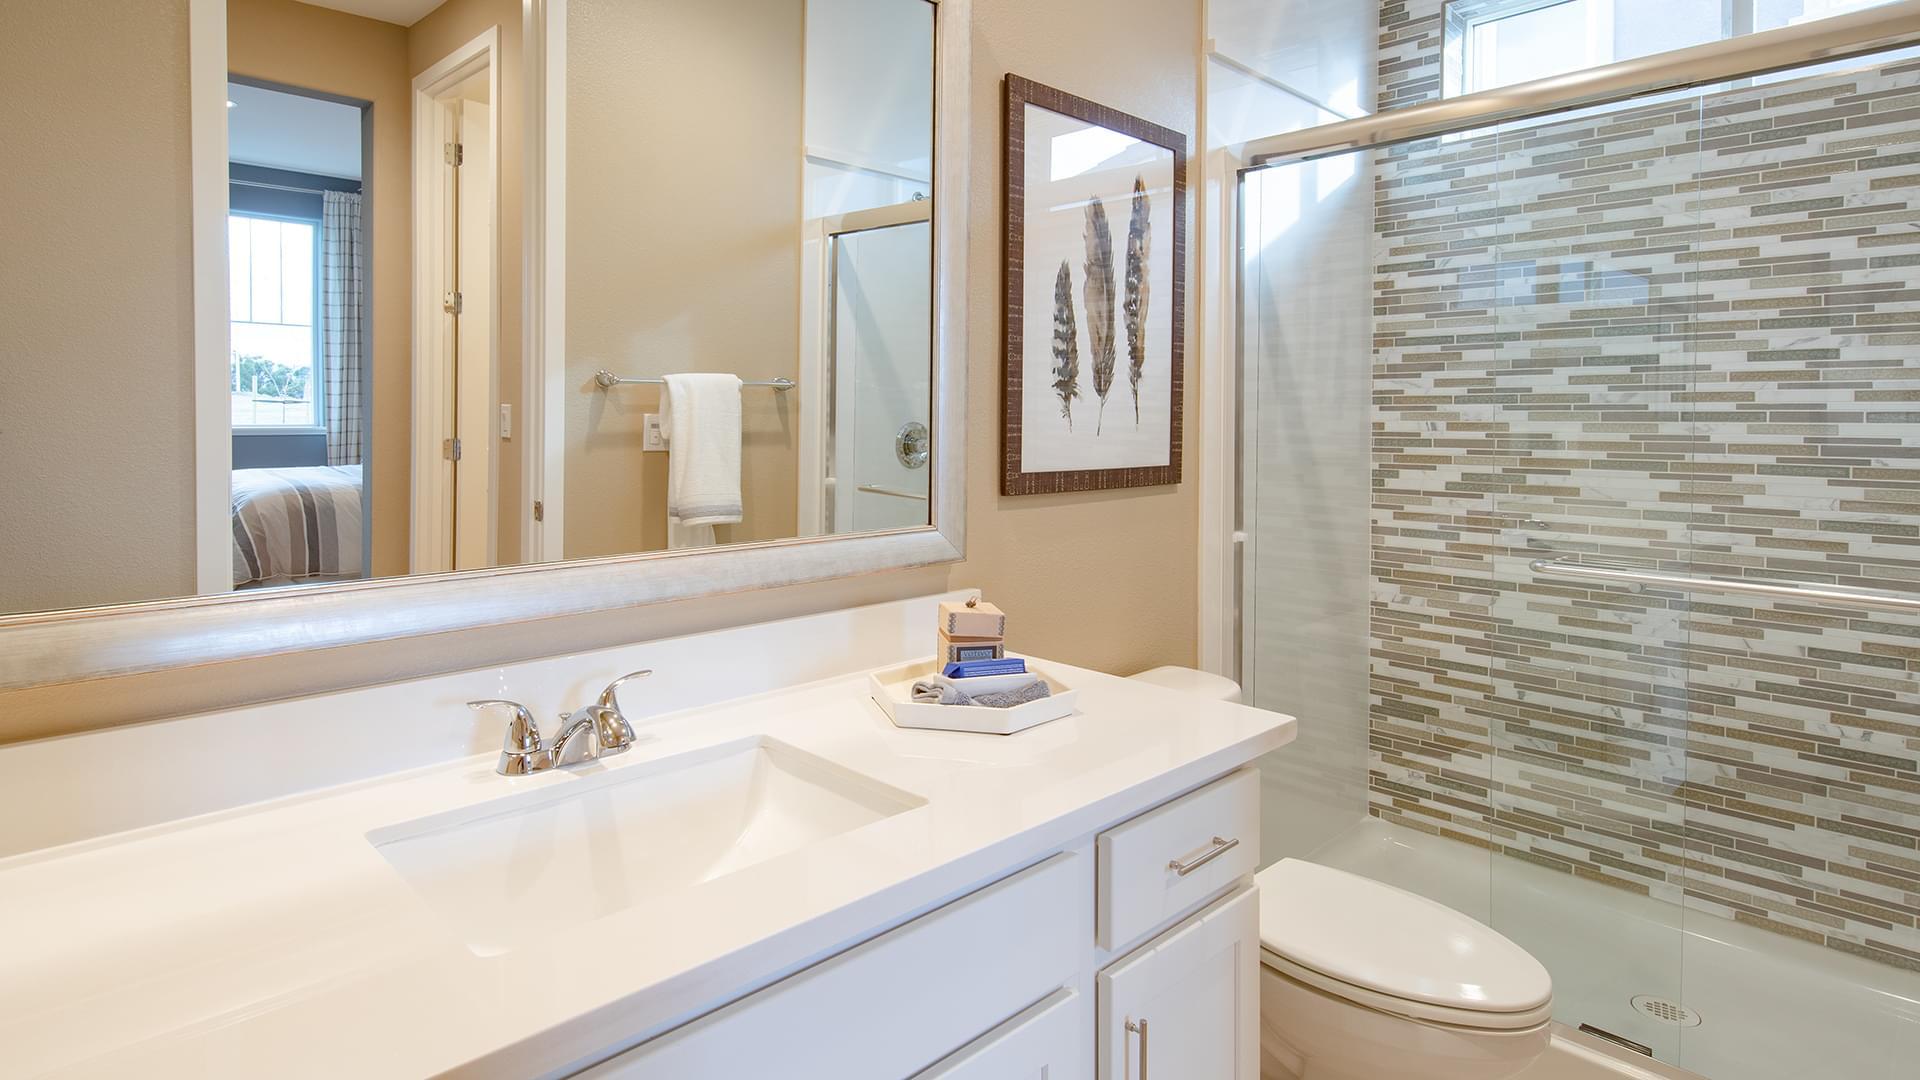 Residence 3 Bath 3